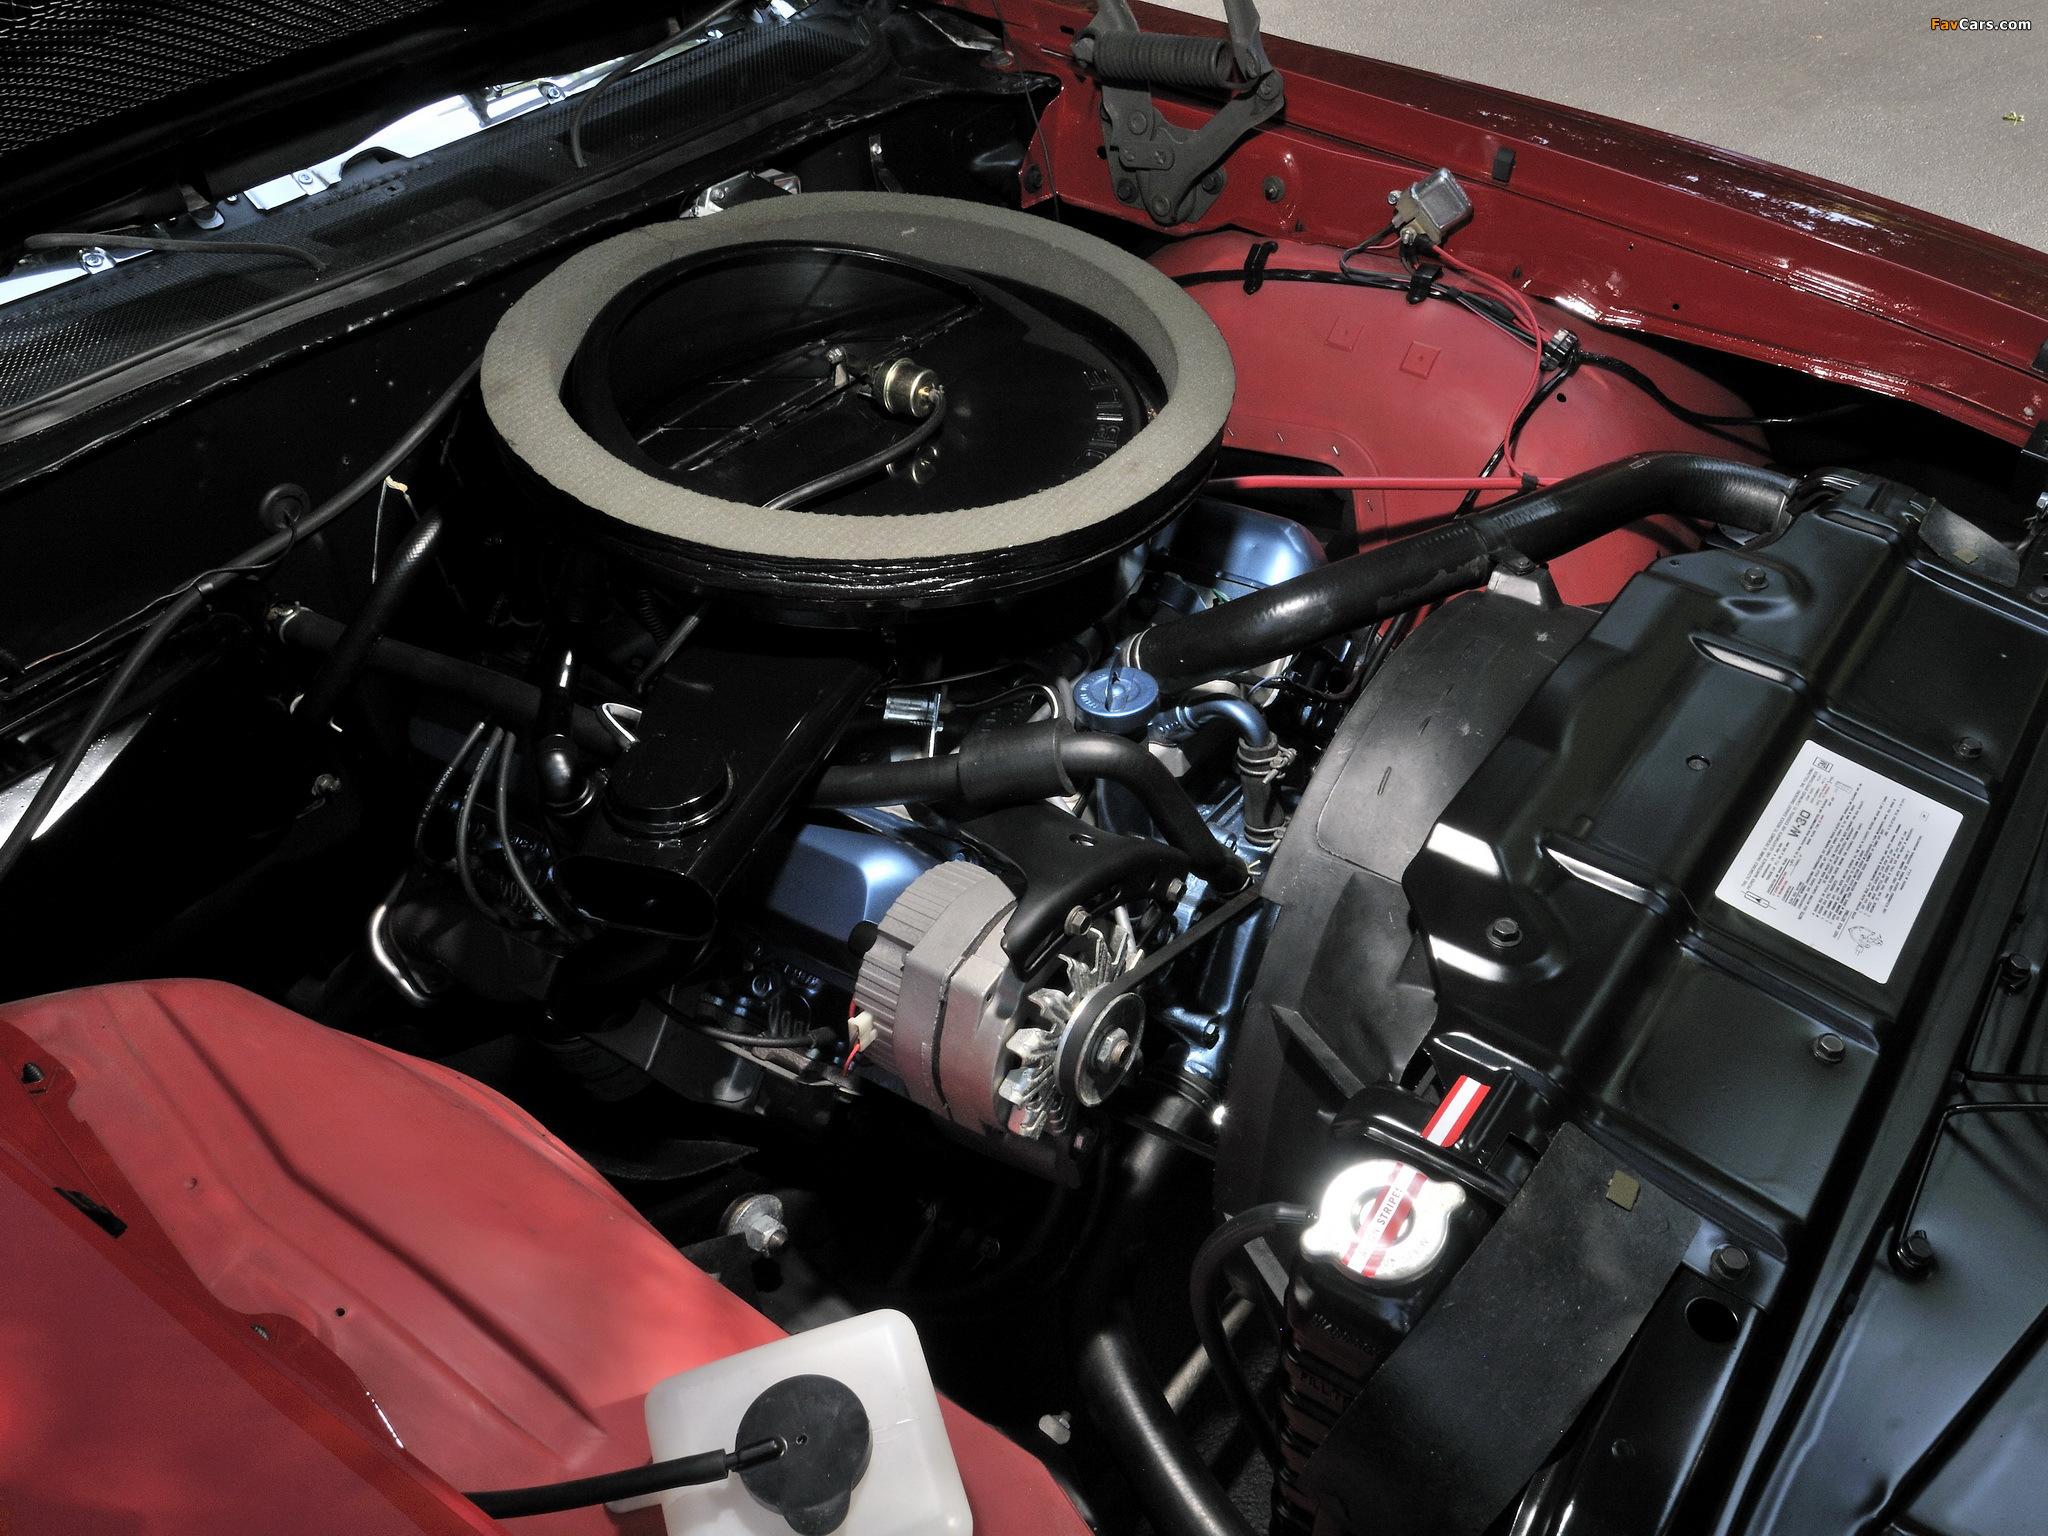 Oldsmobile 442 W-30 Sport Coupe (4477) 1970 photos (2048 x 1536)